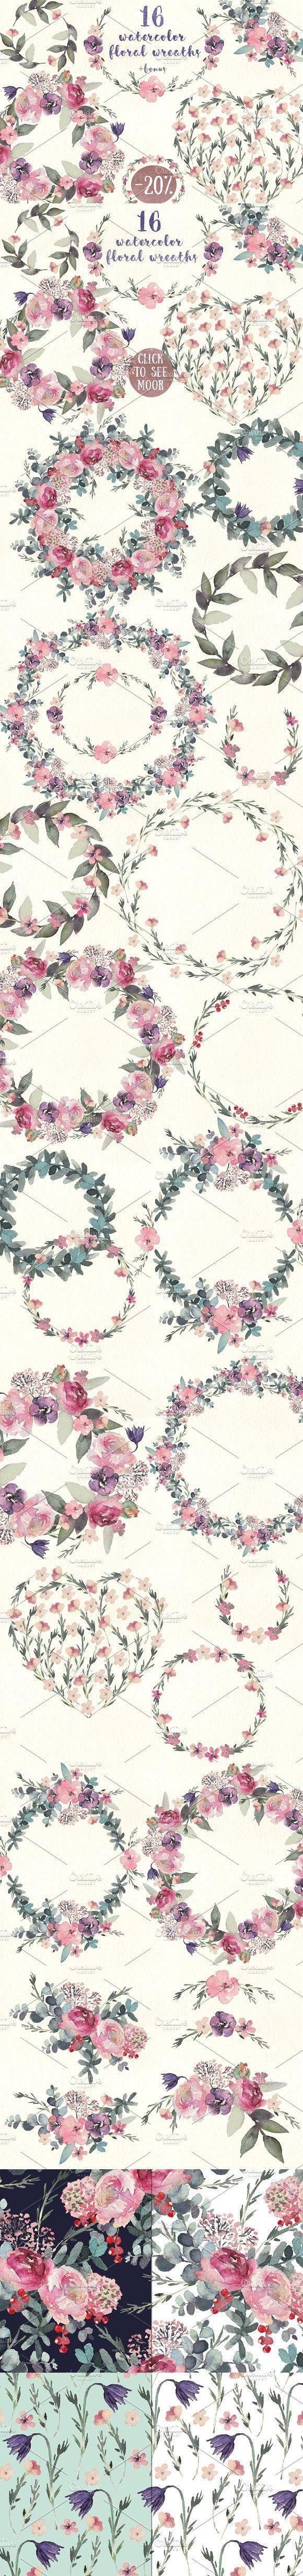 Watercolor floral wreaths pack. Watercolor Flowers. $15.00